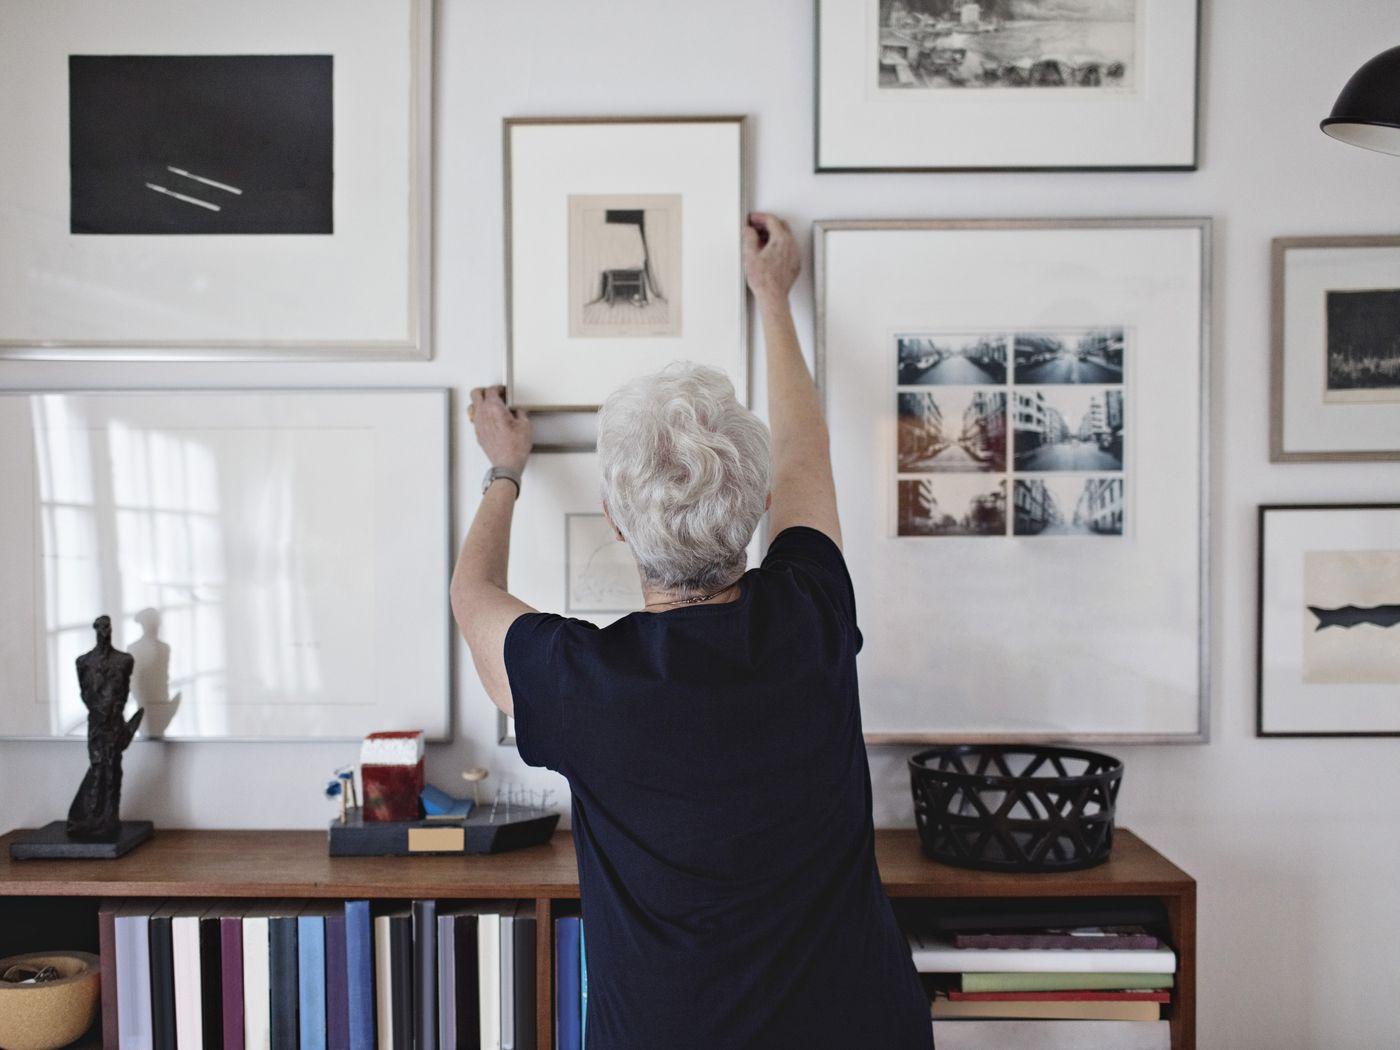 Woman touching wall paintings